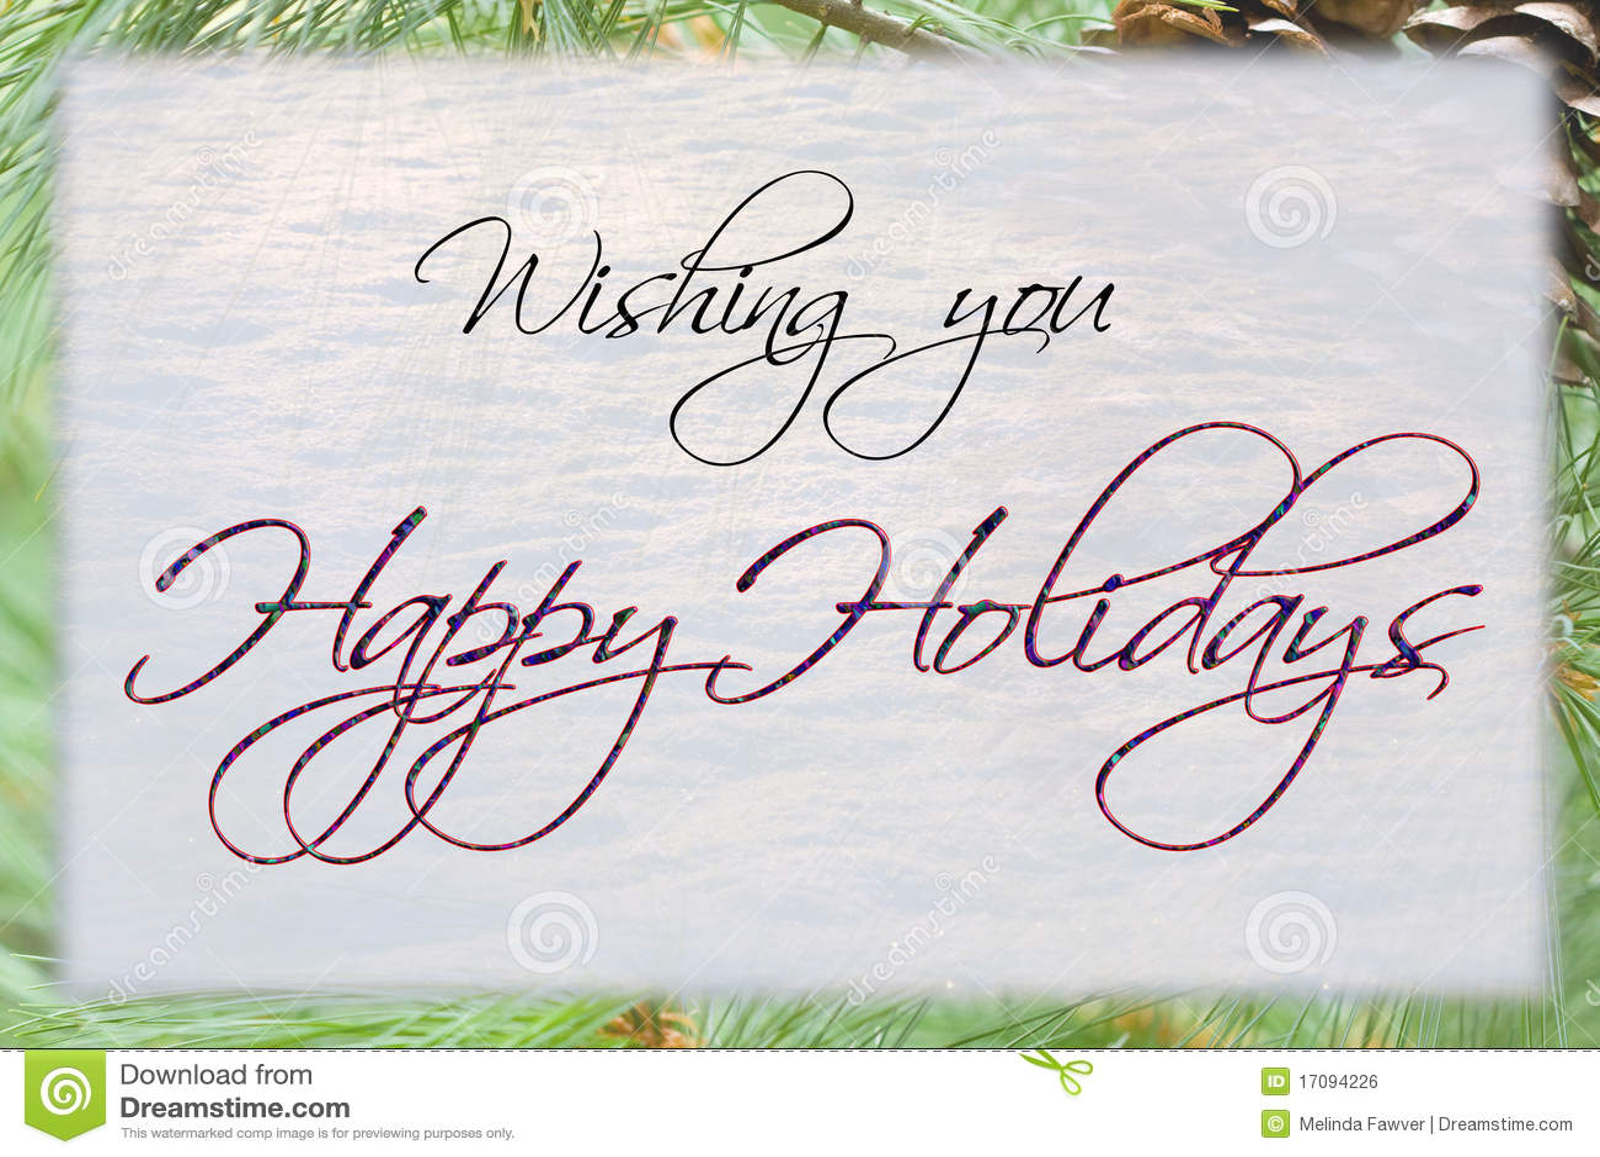 happy holidays card stock illustration illustration of snow 17094226